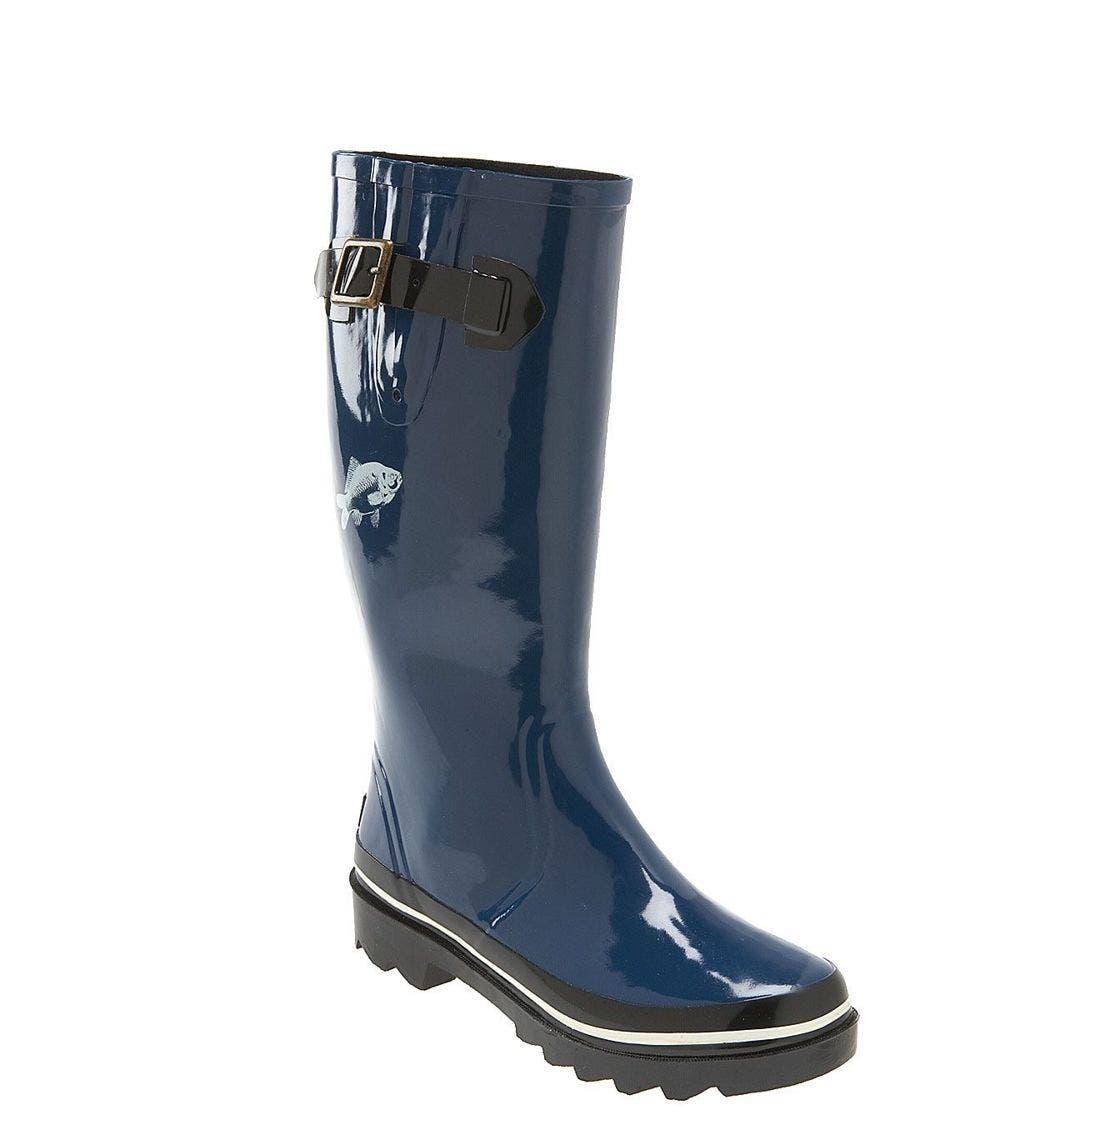 KATE SPADE NEW YORK kate spade 'riley' red daisy rain boot, Main, color, BLU